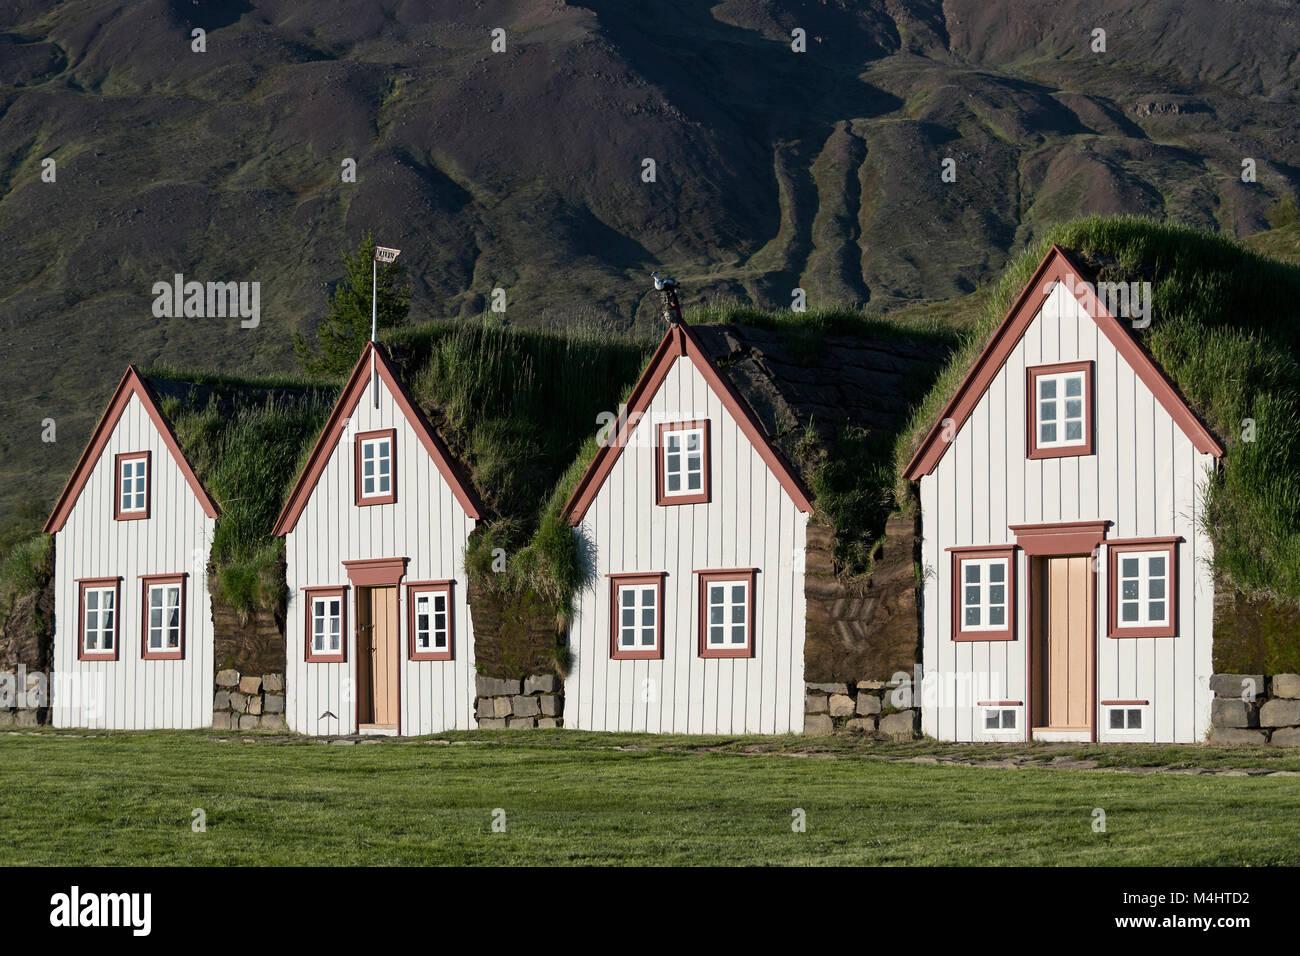 Old icelandic turf houses Laufás, open-air museum, Eyjafjörður, North-Iceland, Iceland - Stock Image